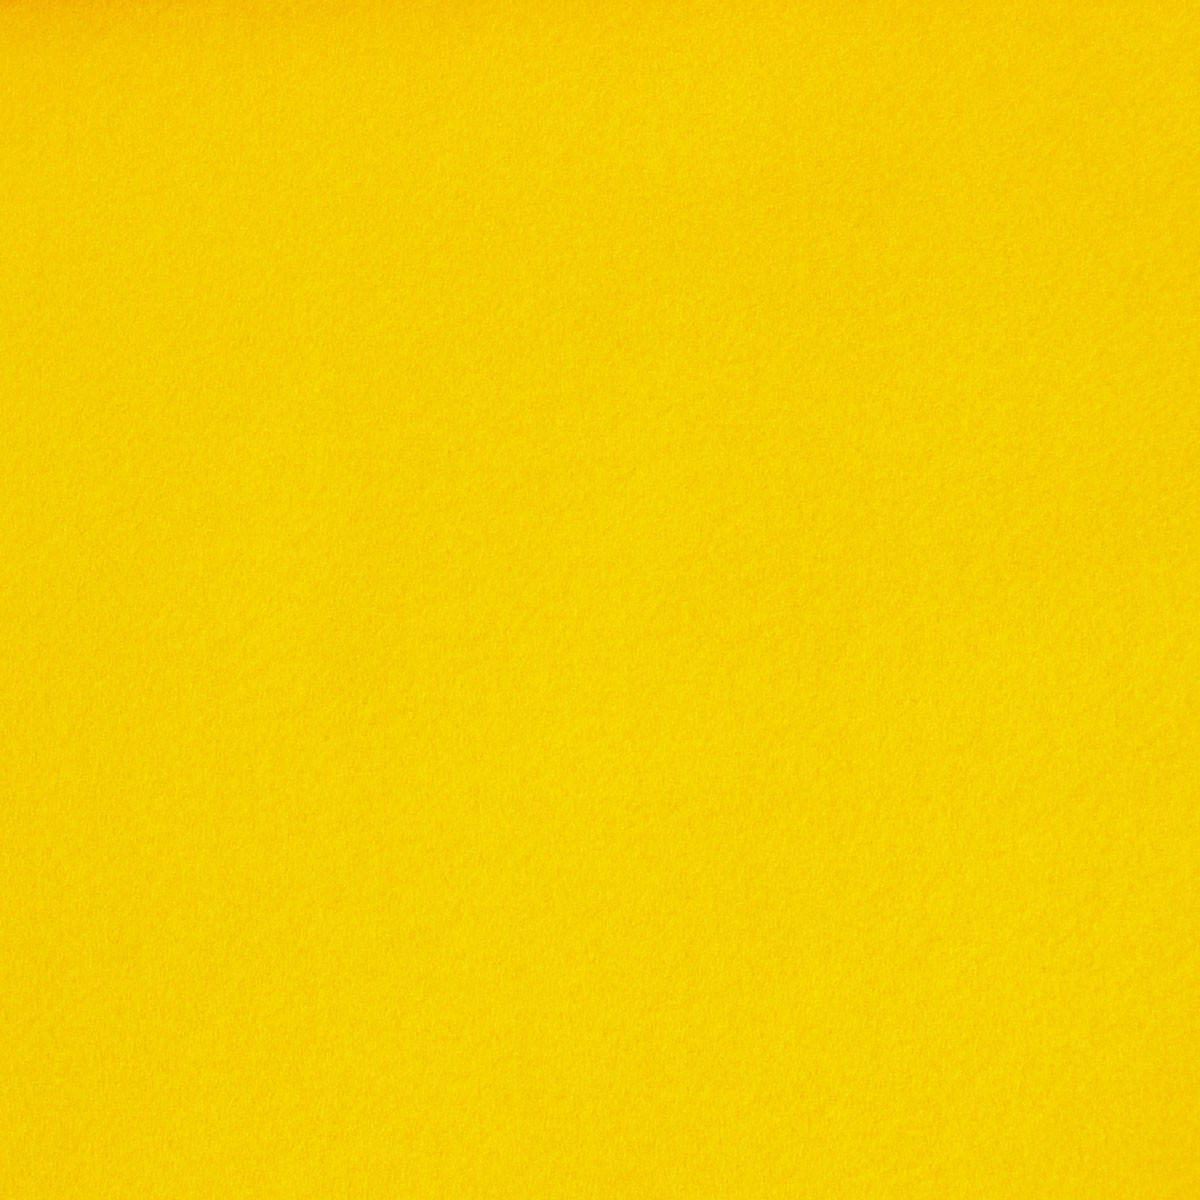 Kreativstoff Filz einfarbig dunkelgelb 180cm Breite 2mm Stärke